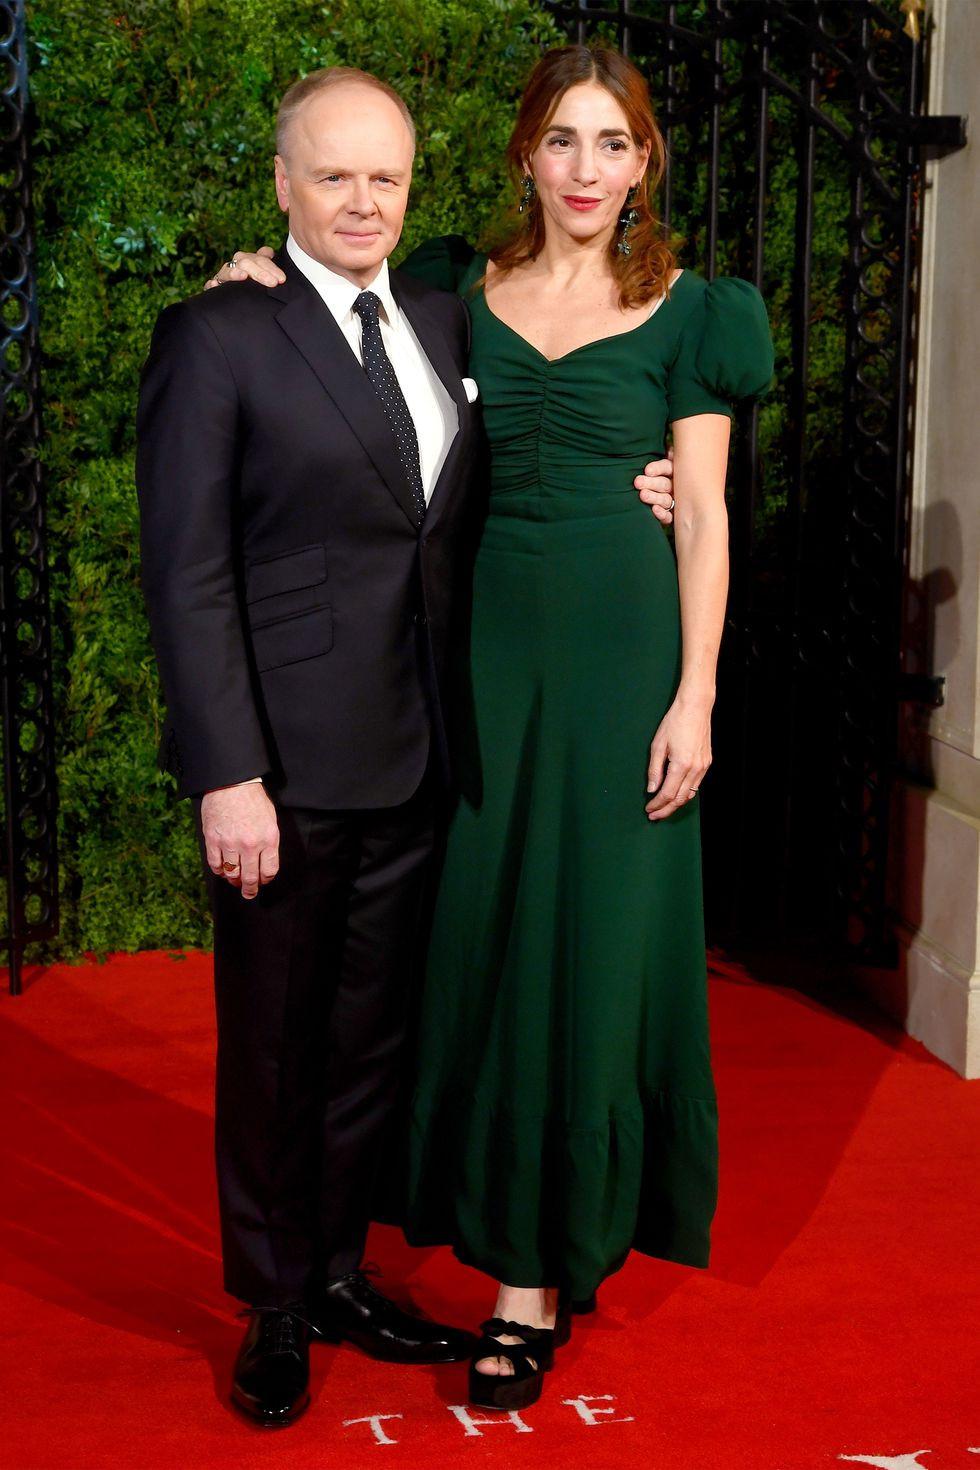 Jason Watkins and wife